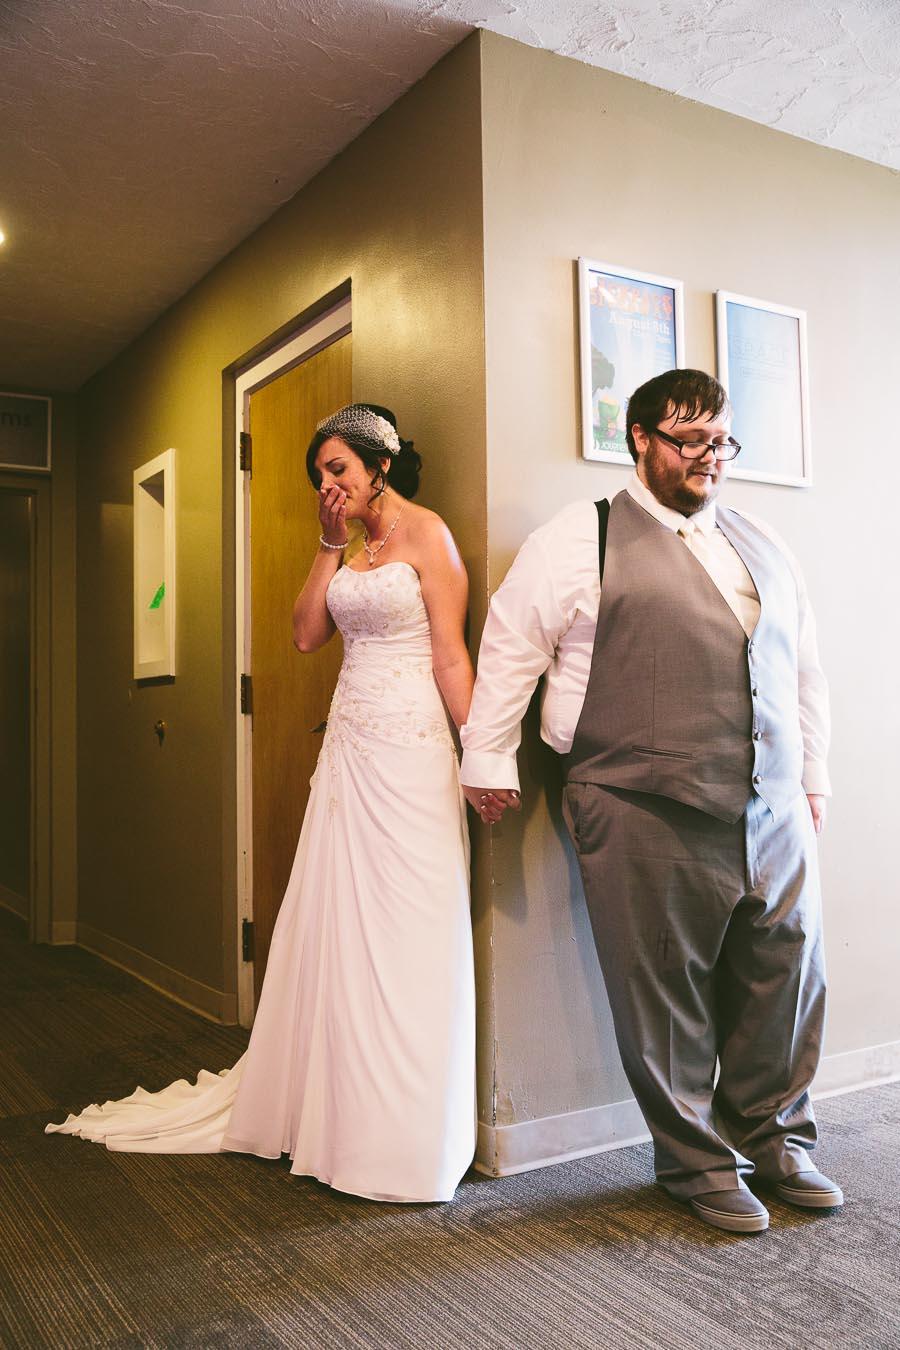 north-olmstead-wedding-photography-at-rubys-grafton-59.jpg